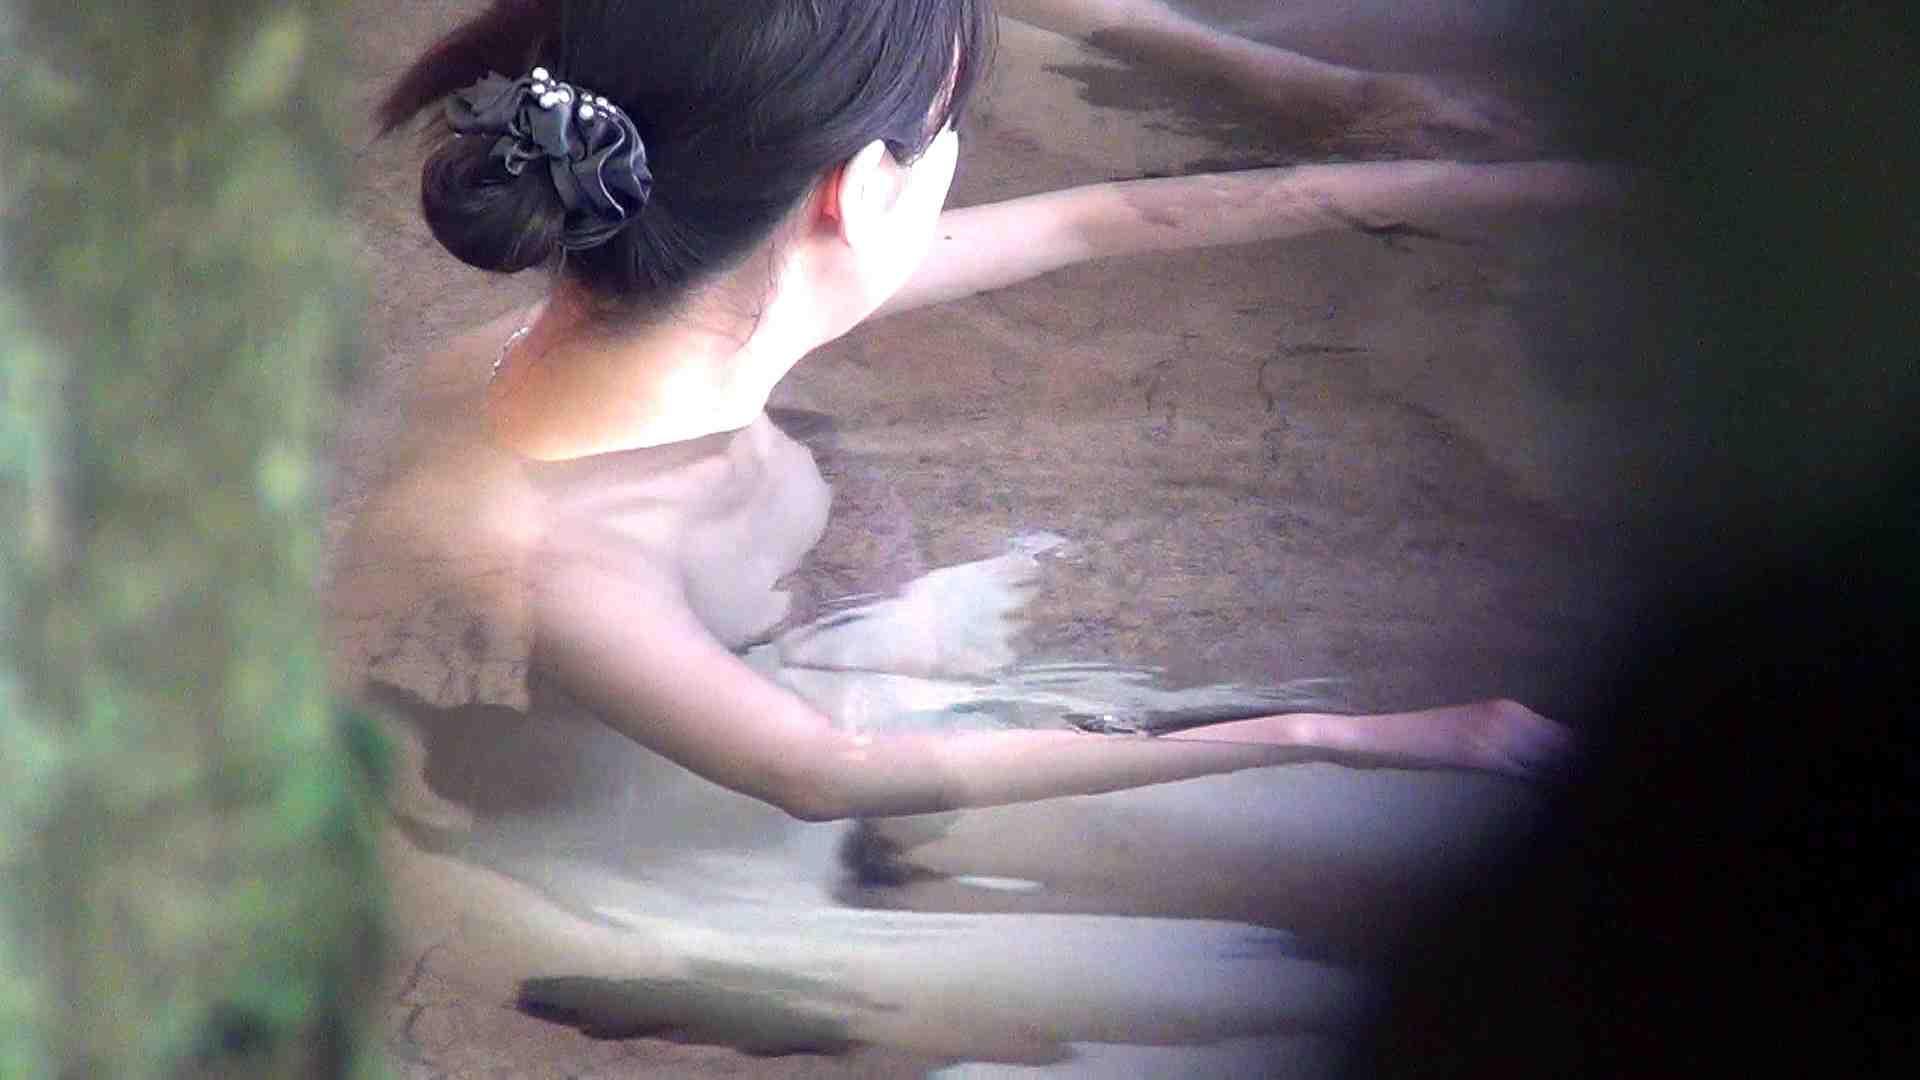 Aquaな露天風呂Vol.285 露天 のぞき動画キャプチャ 27連発 24